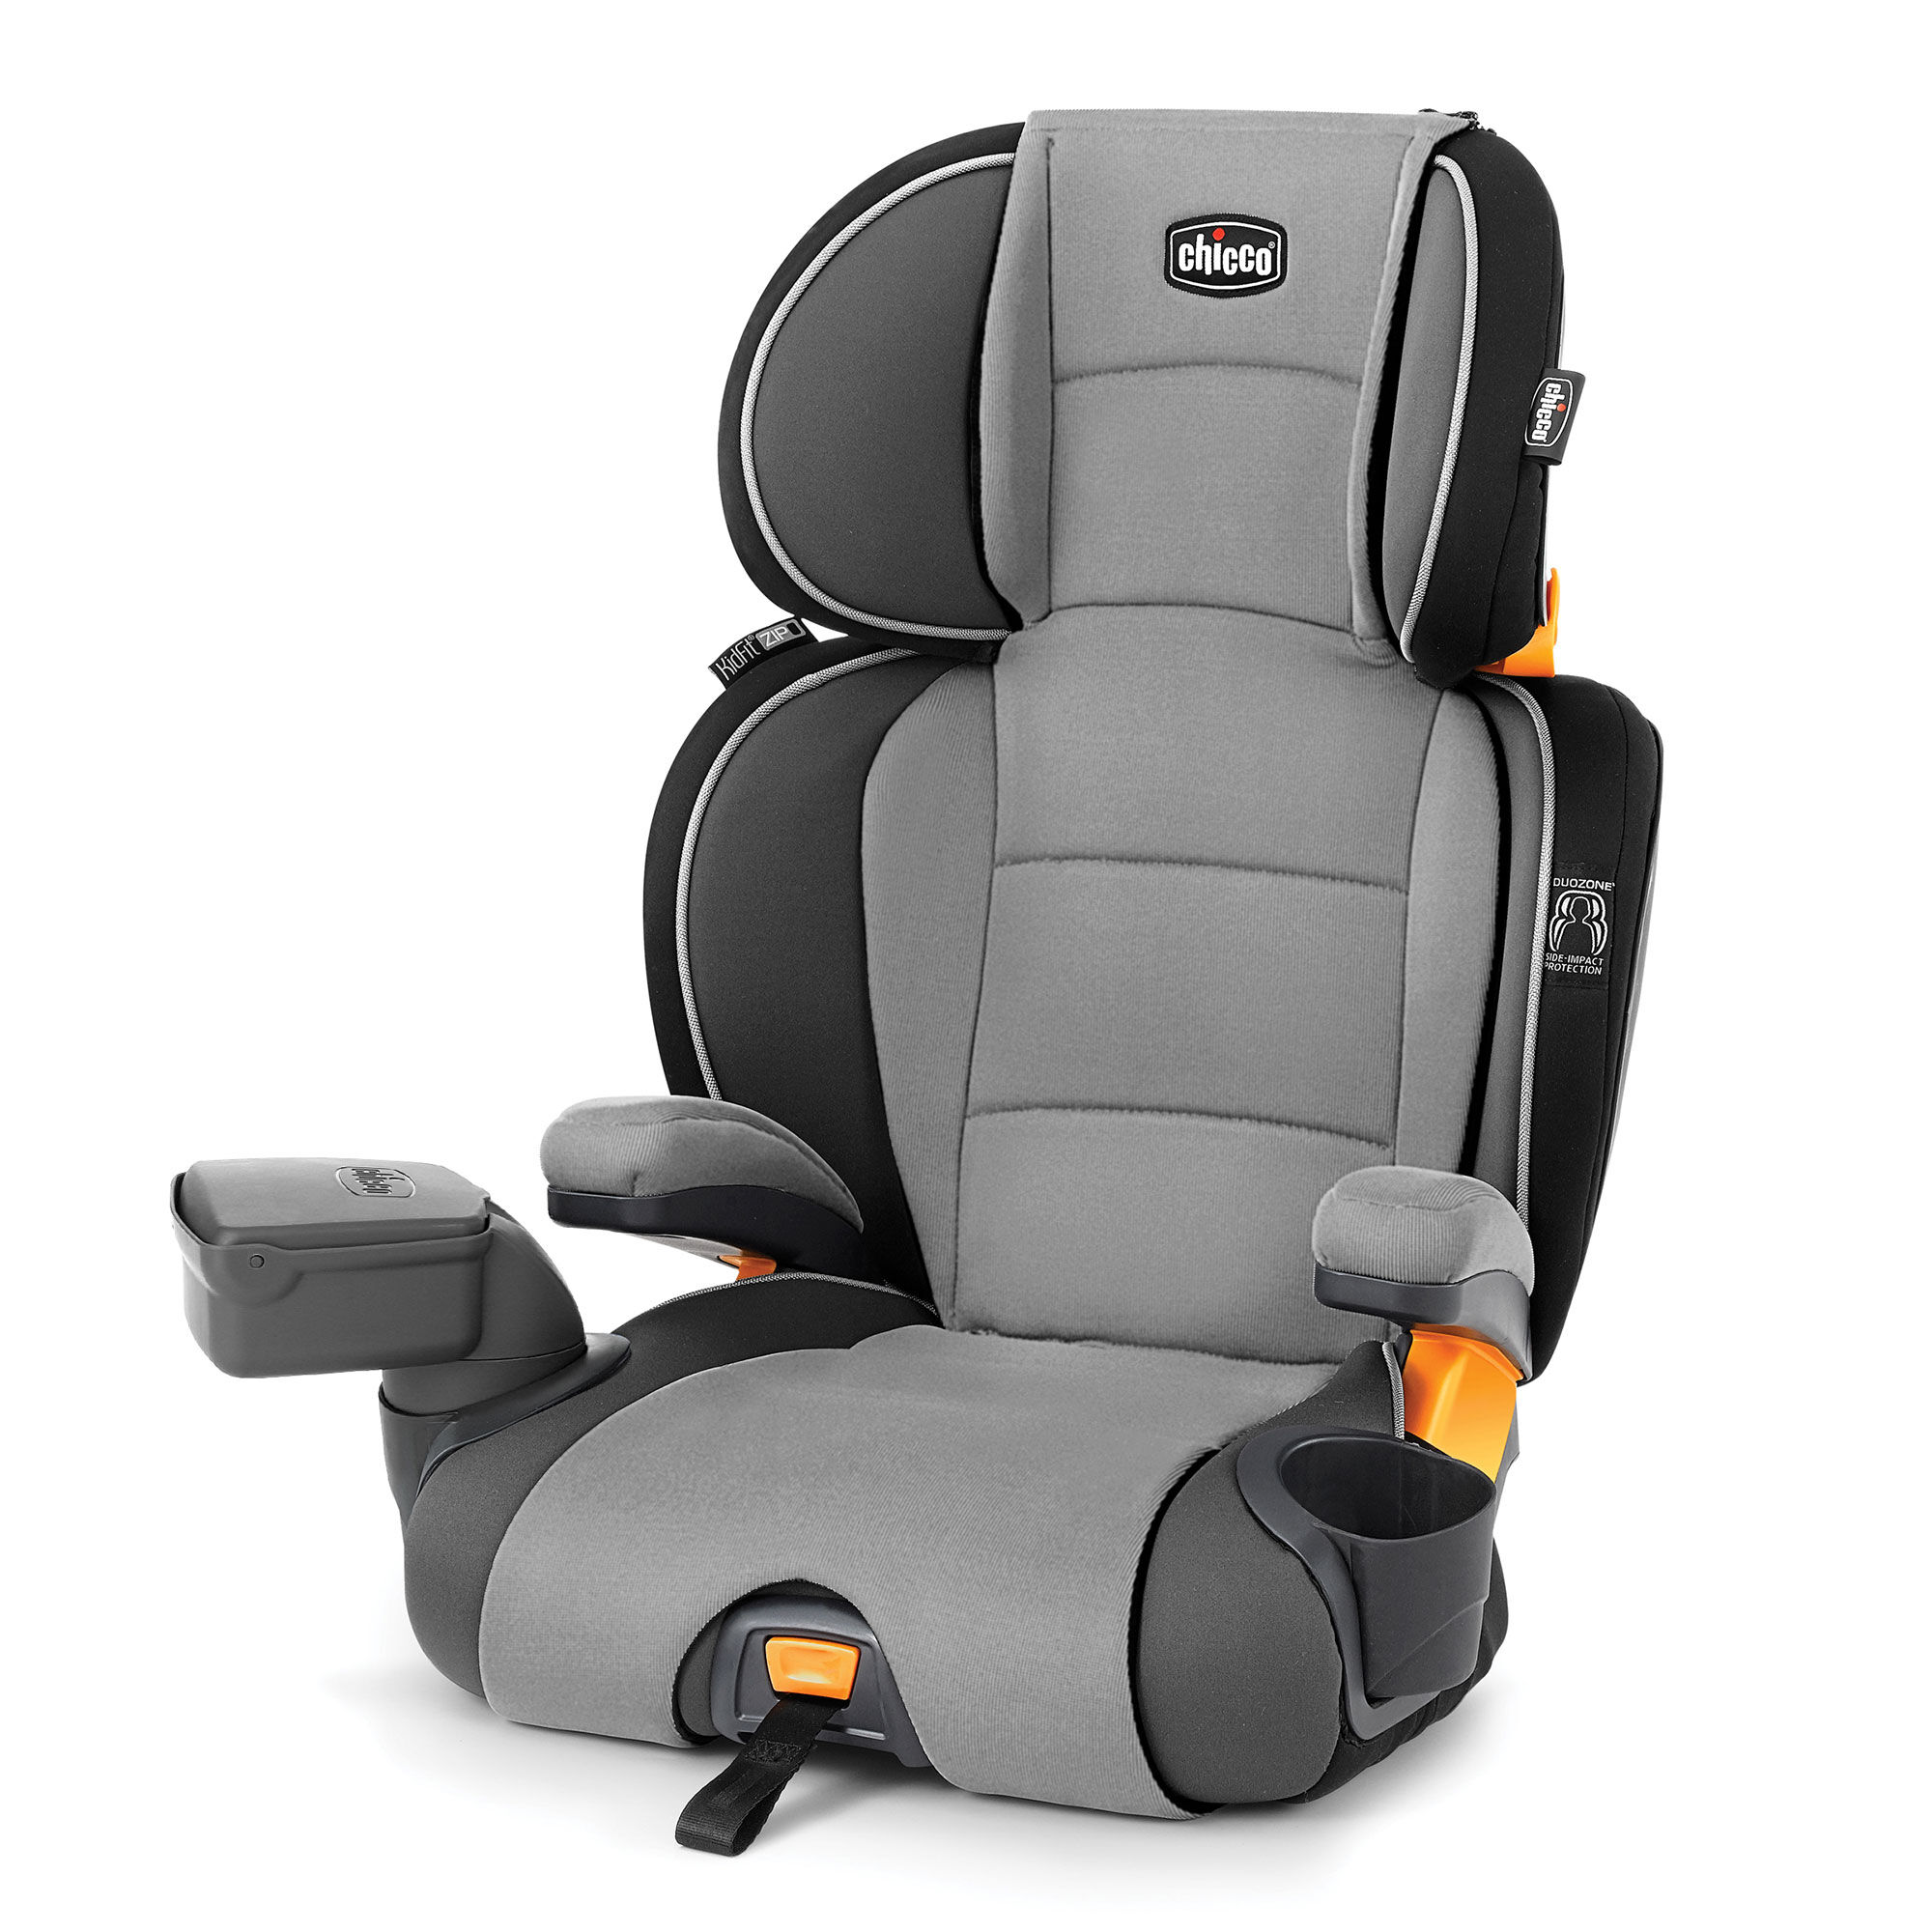 Chicco Kidfit Zip 2in1 Belt Positioning Booster Car Seat Spectrum. Kidfit Zip 2in1 Belt Positioning Booster Car Seat Spectrum In. Seat. Seat Belt Harness Zipper At Scoala.co